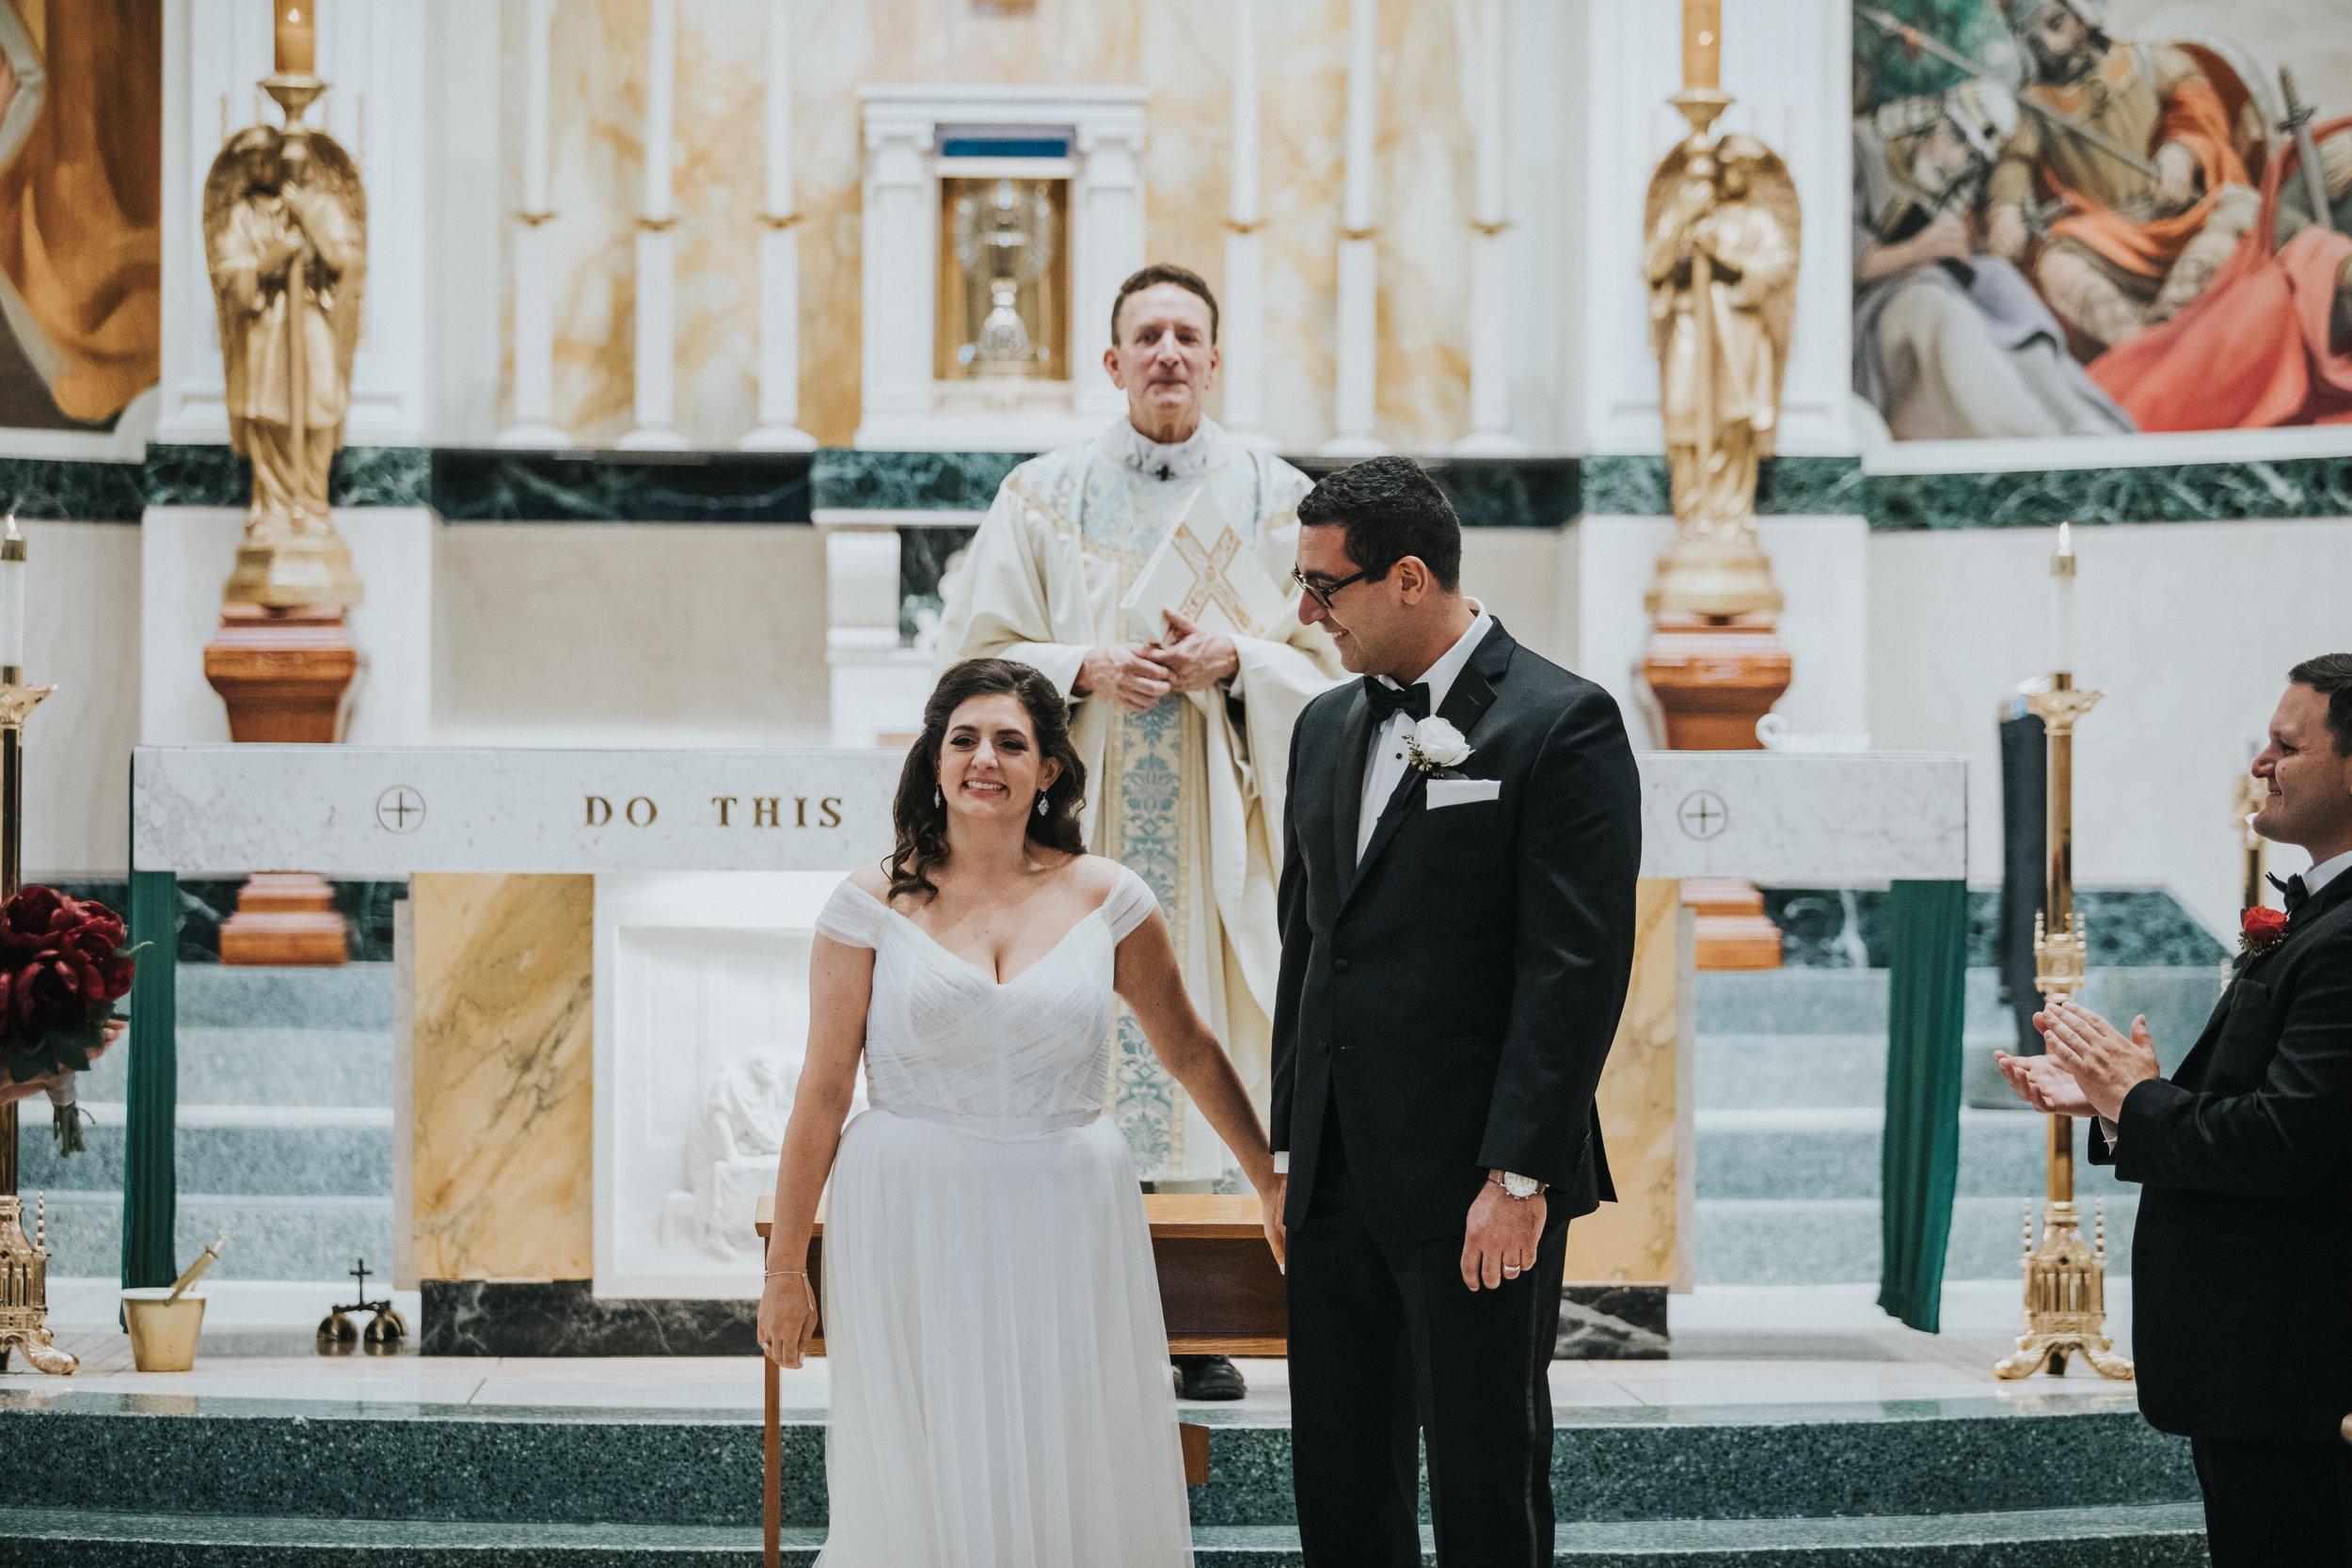 JennaLynnPhotography-NJWeddingPhotographer-Philadelphia-Wedding-ArtsBallroom-Ceremony-64.jpg